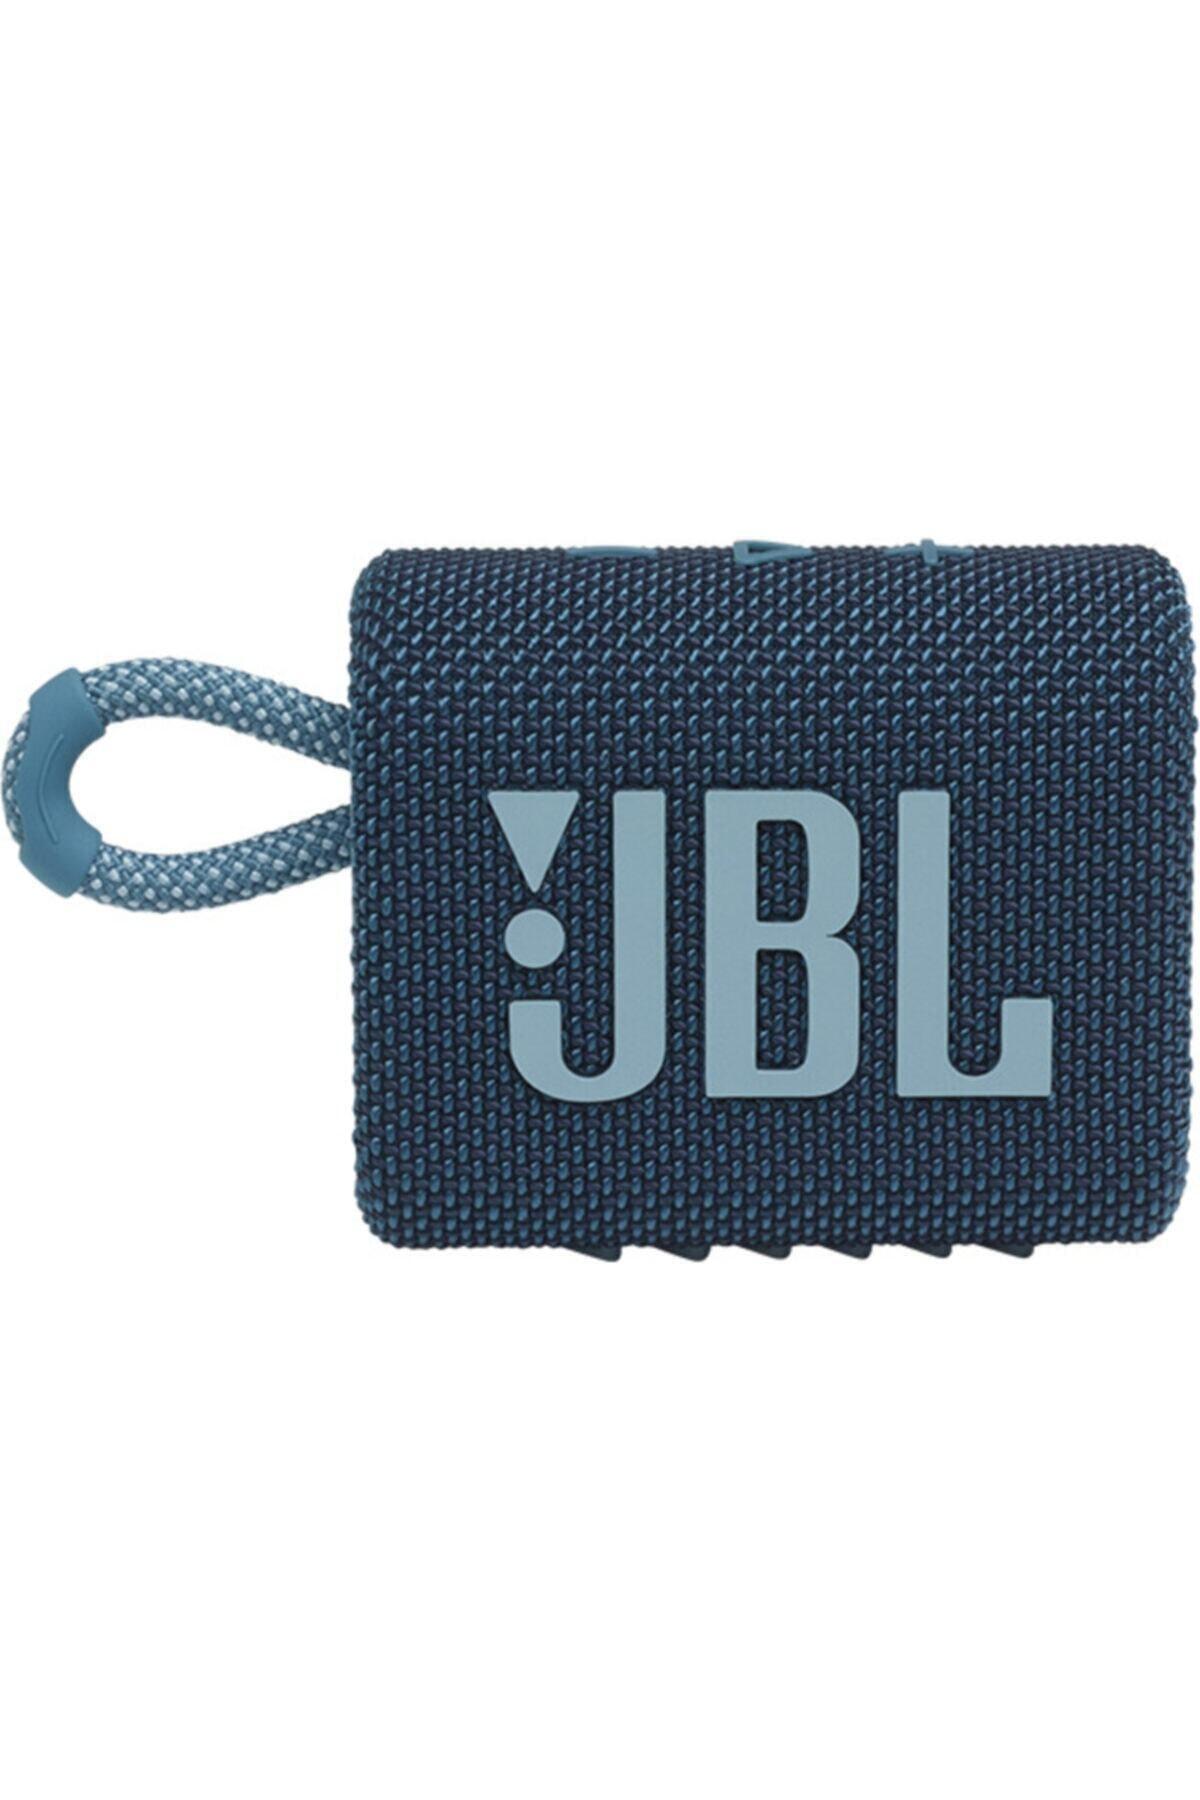 JBL Go 3 Mavi Bluetooth Hoparlör 2